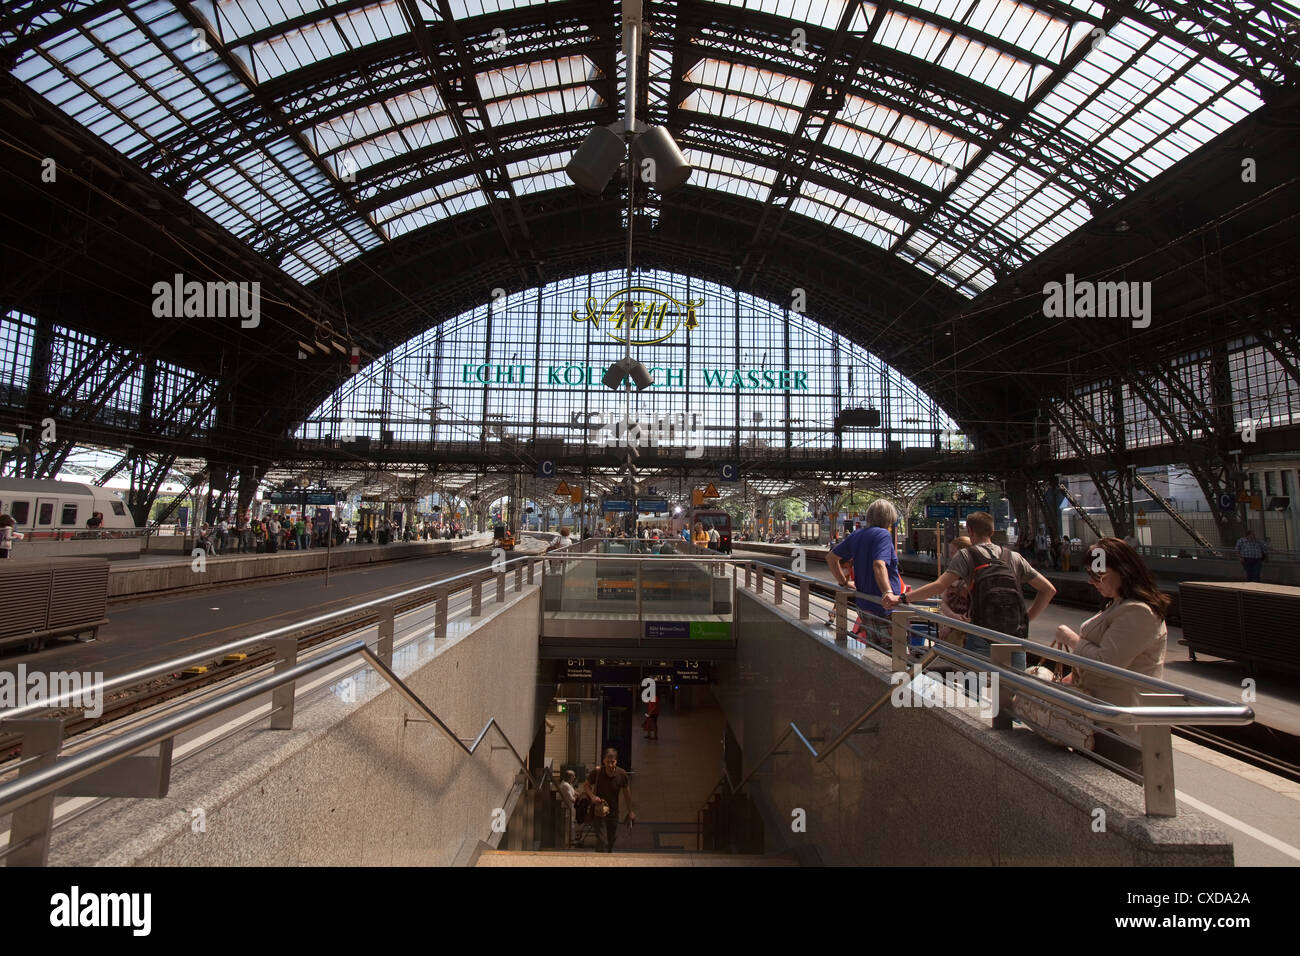 Main train station, Deutsche Bahn AG, Cologne, Germany, Europe - Stock Image